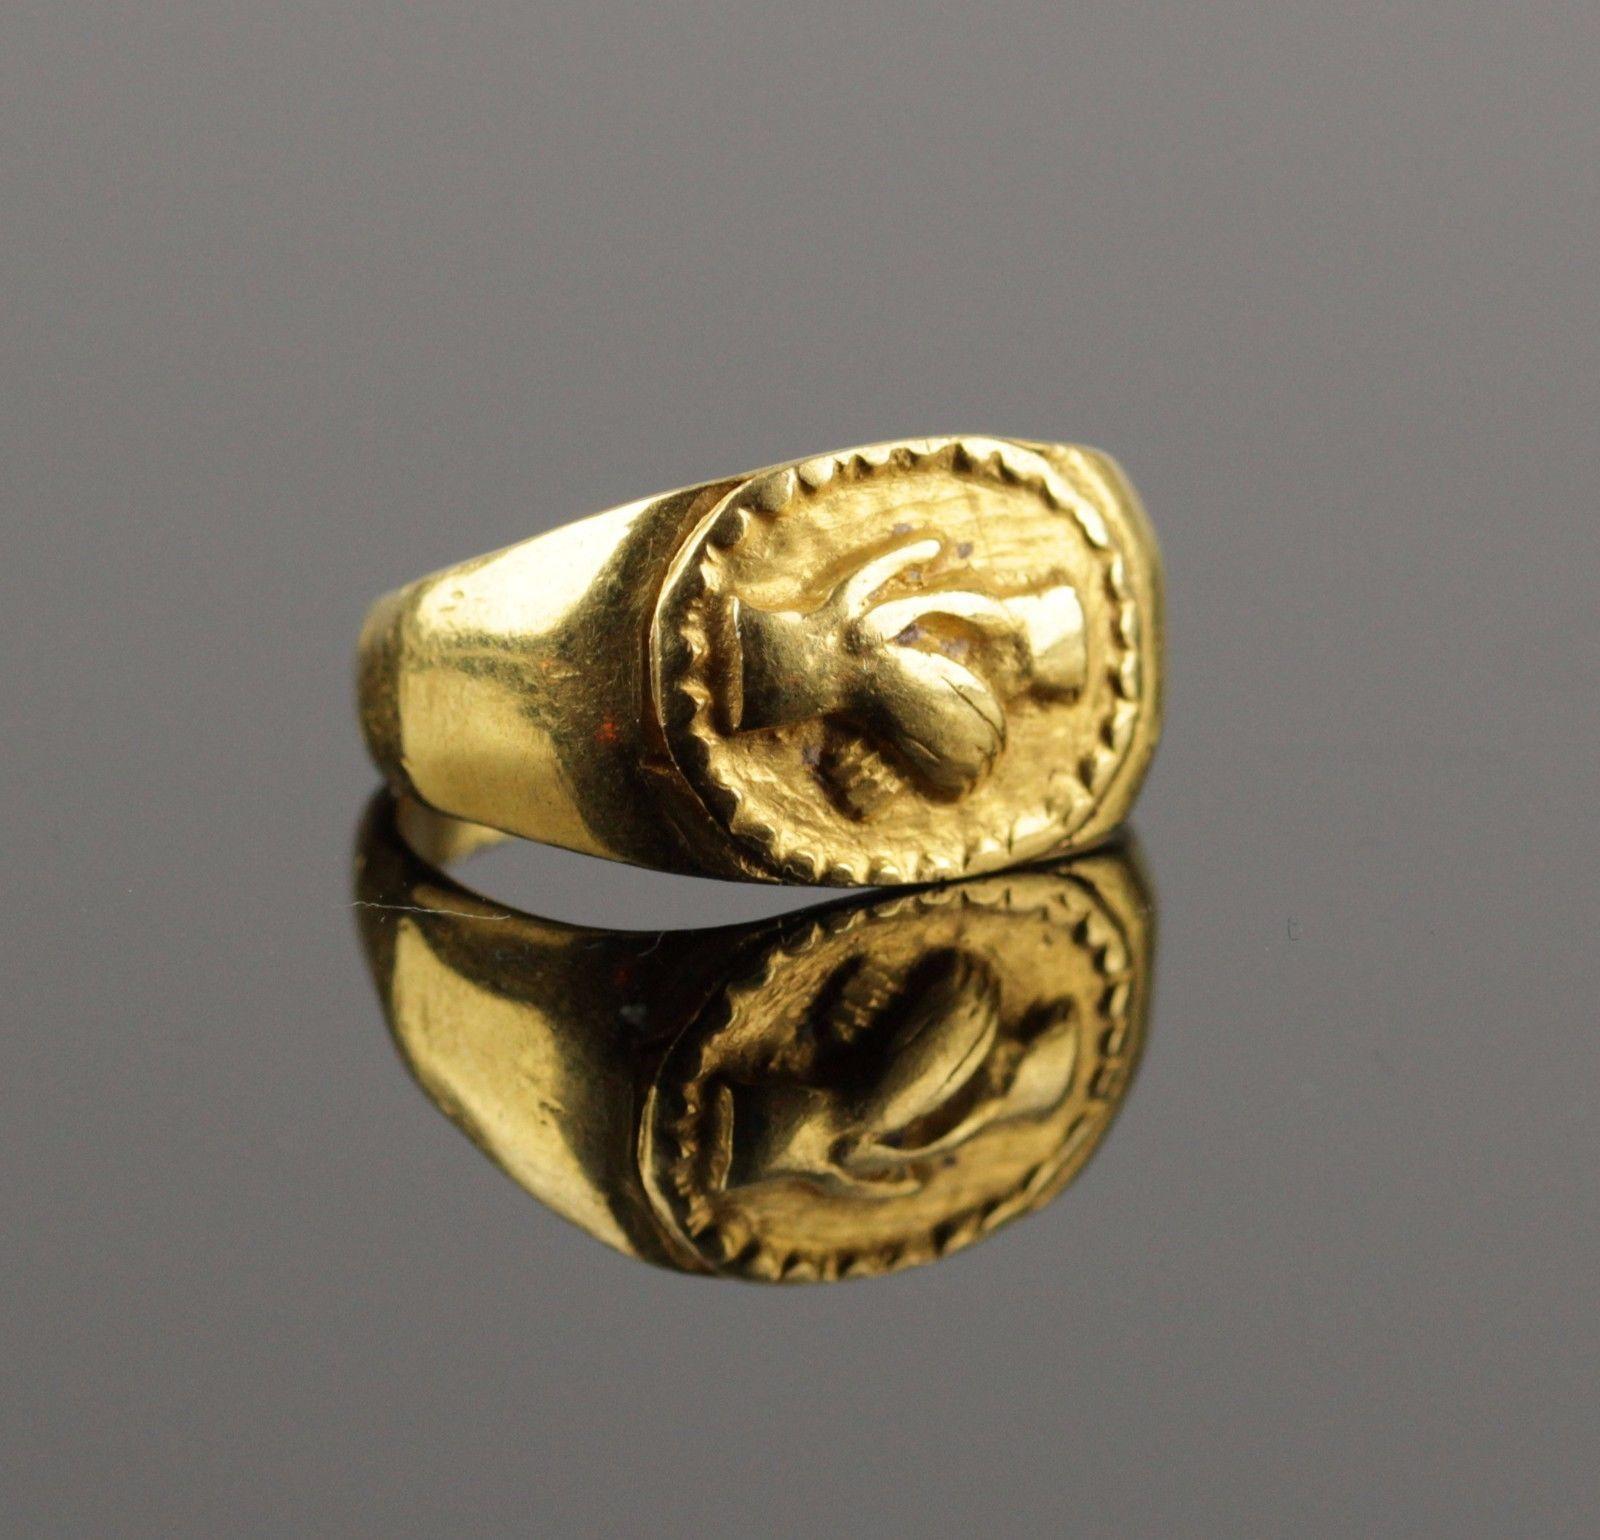 STUNNING ANCIENT ROMAN GOLD WEDDING RING CIRCA 2ND C AD